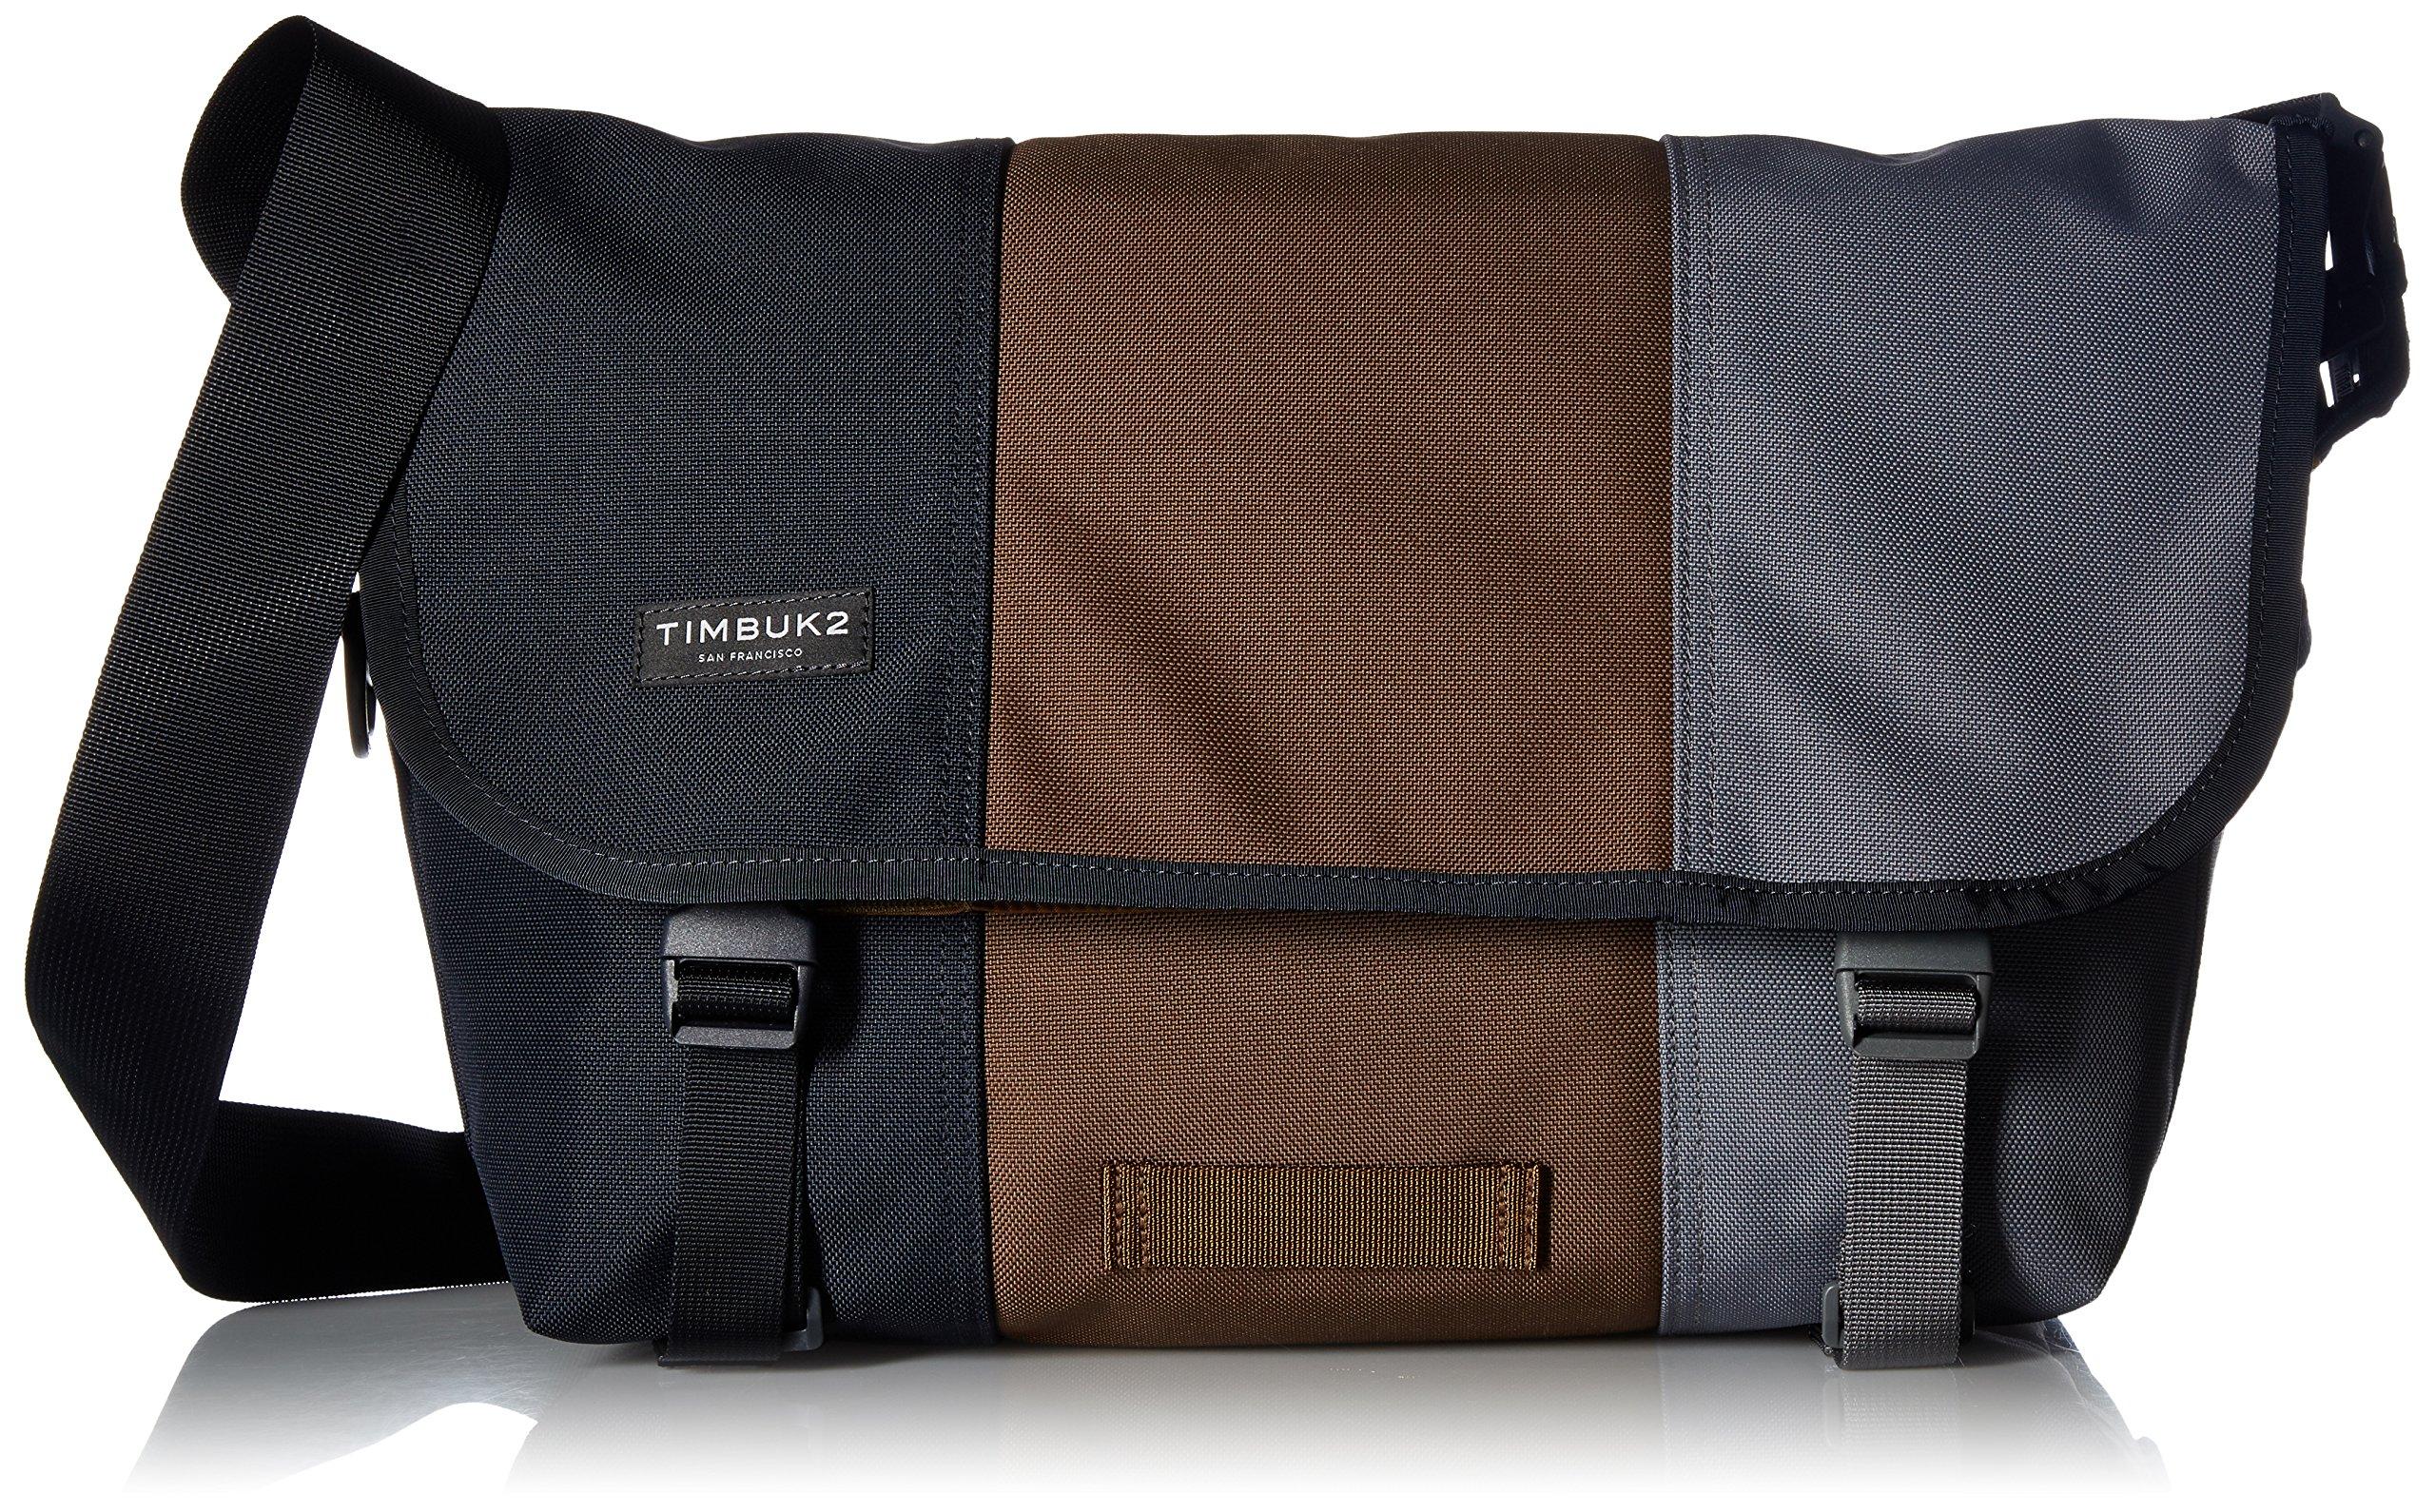 Timbuk2 Classic Tres colores Messenger Bag by Timbuk2